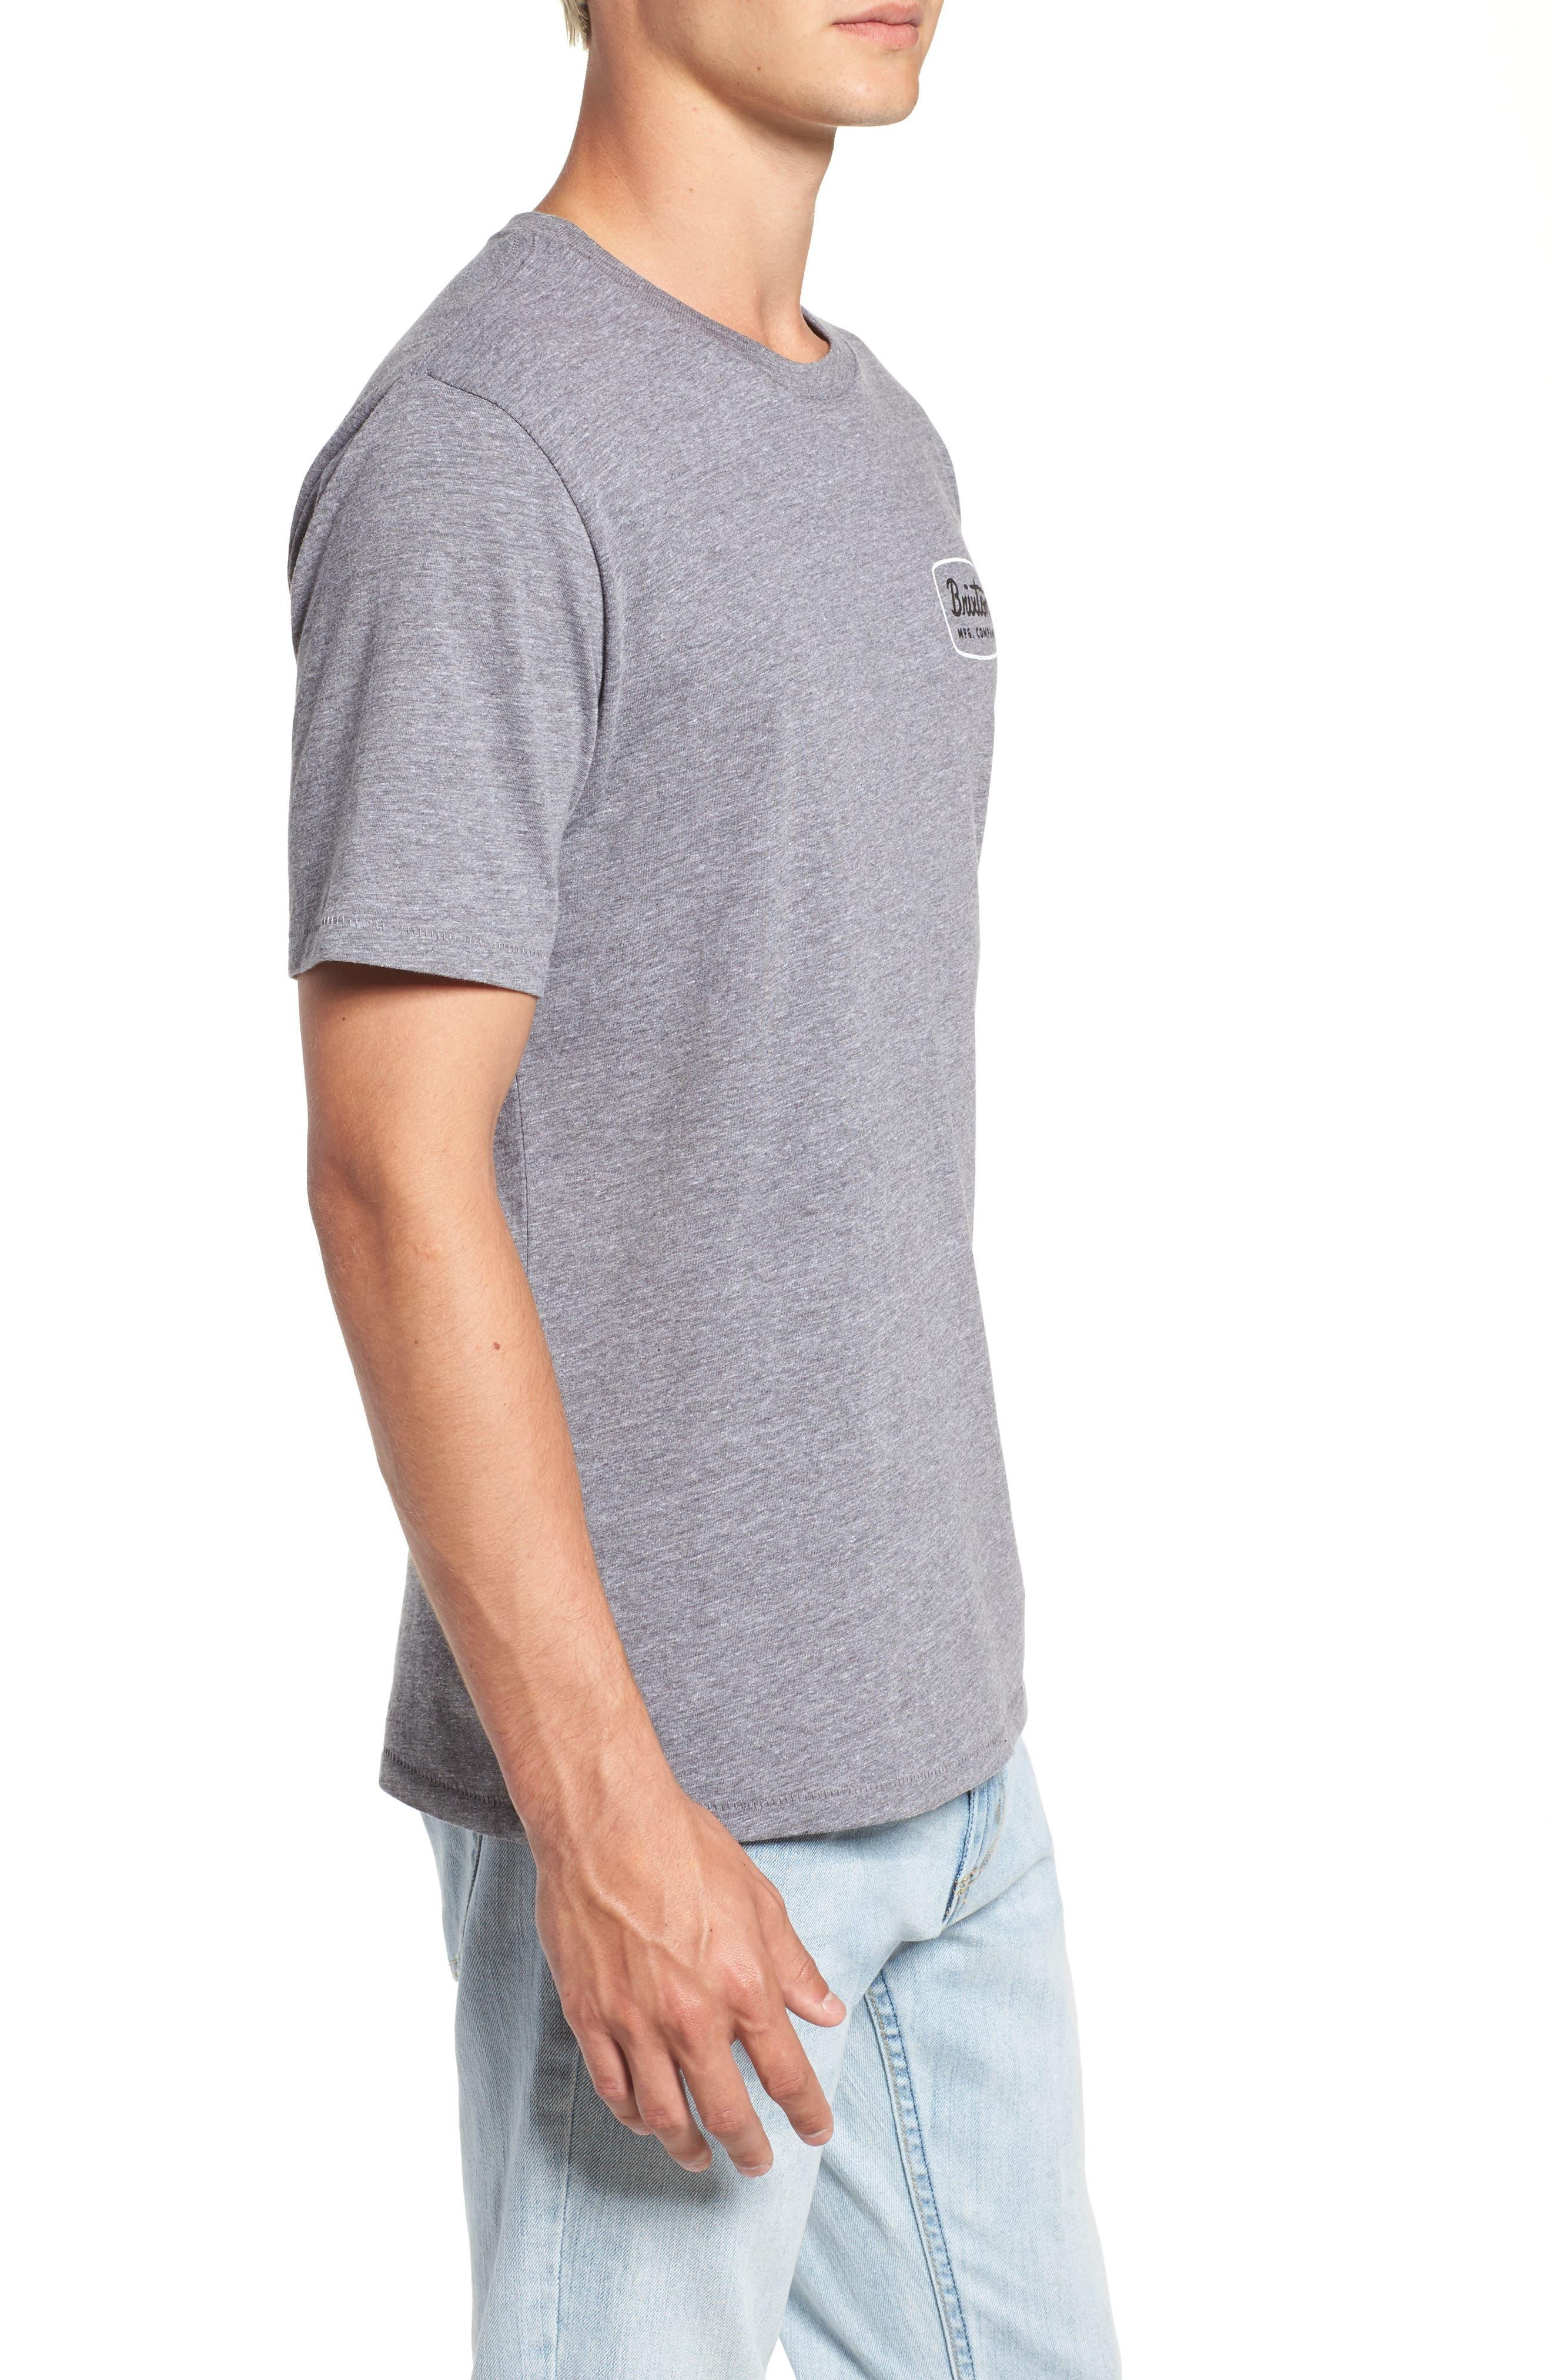 Jolt T-Shirt,                             Alternate thumbnail 3, color,                             HEATHER GREY/ WHITE